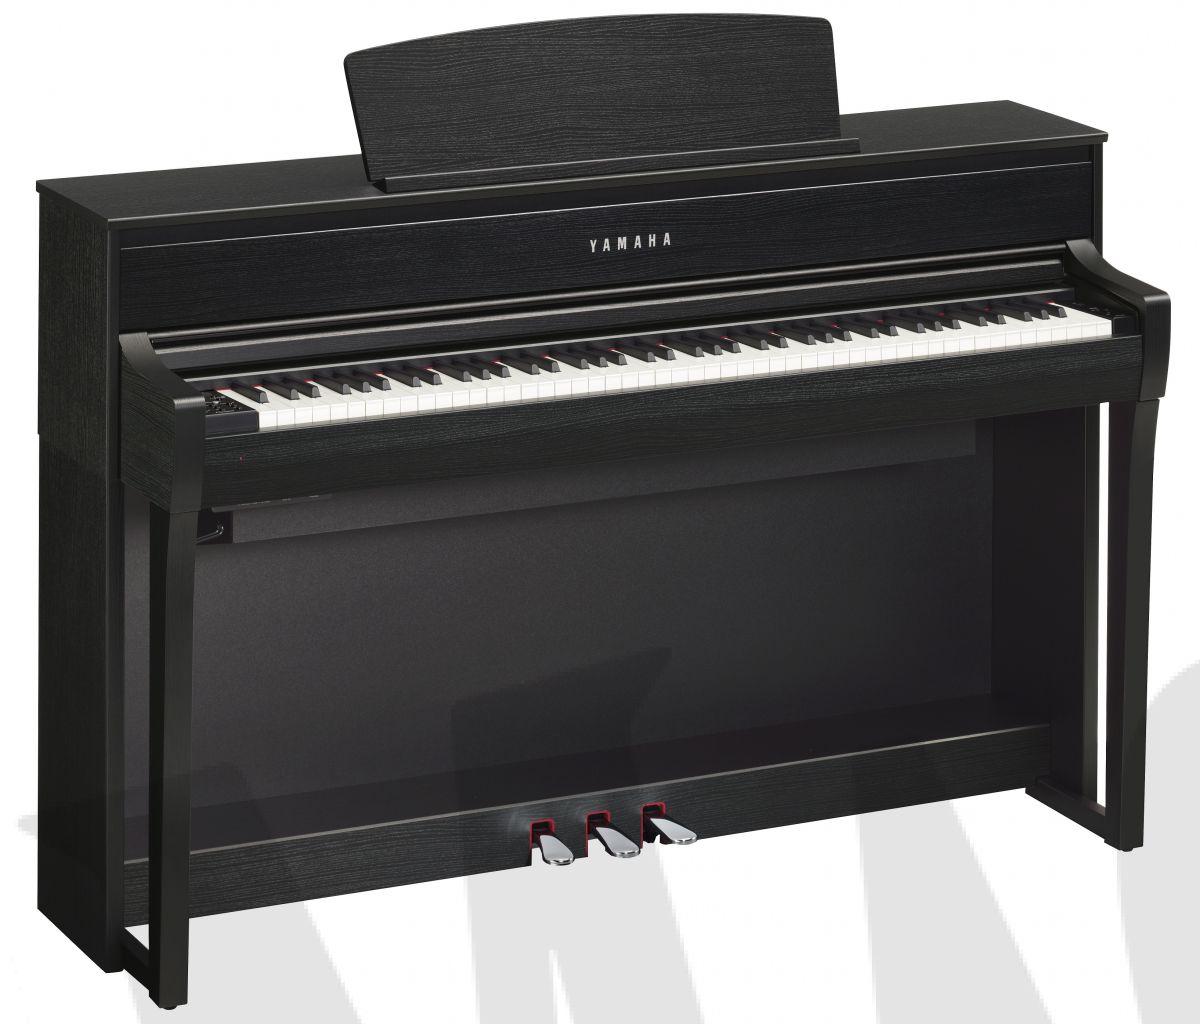 yamaha clp 675 b yamaha magnus hurtownia muzyczna. Black Bedroom Furniture Sets. Home Design Ideas